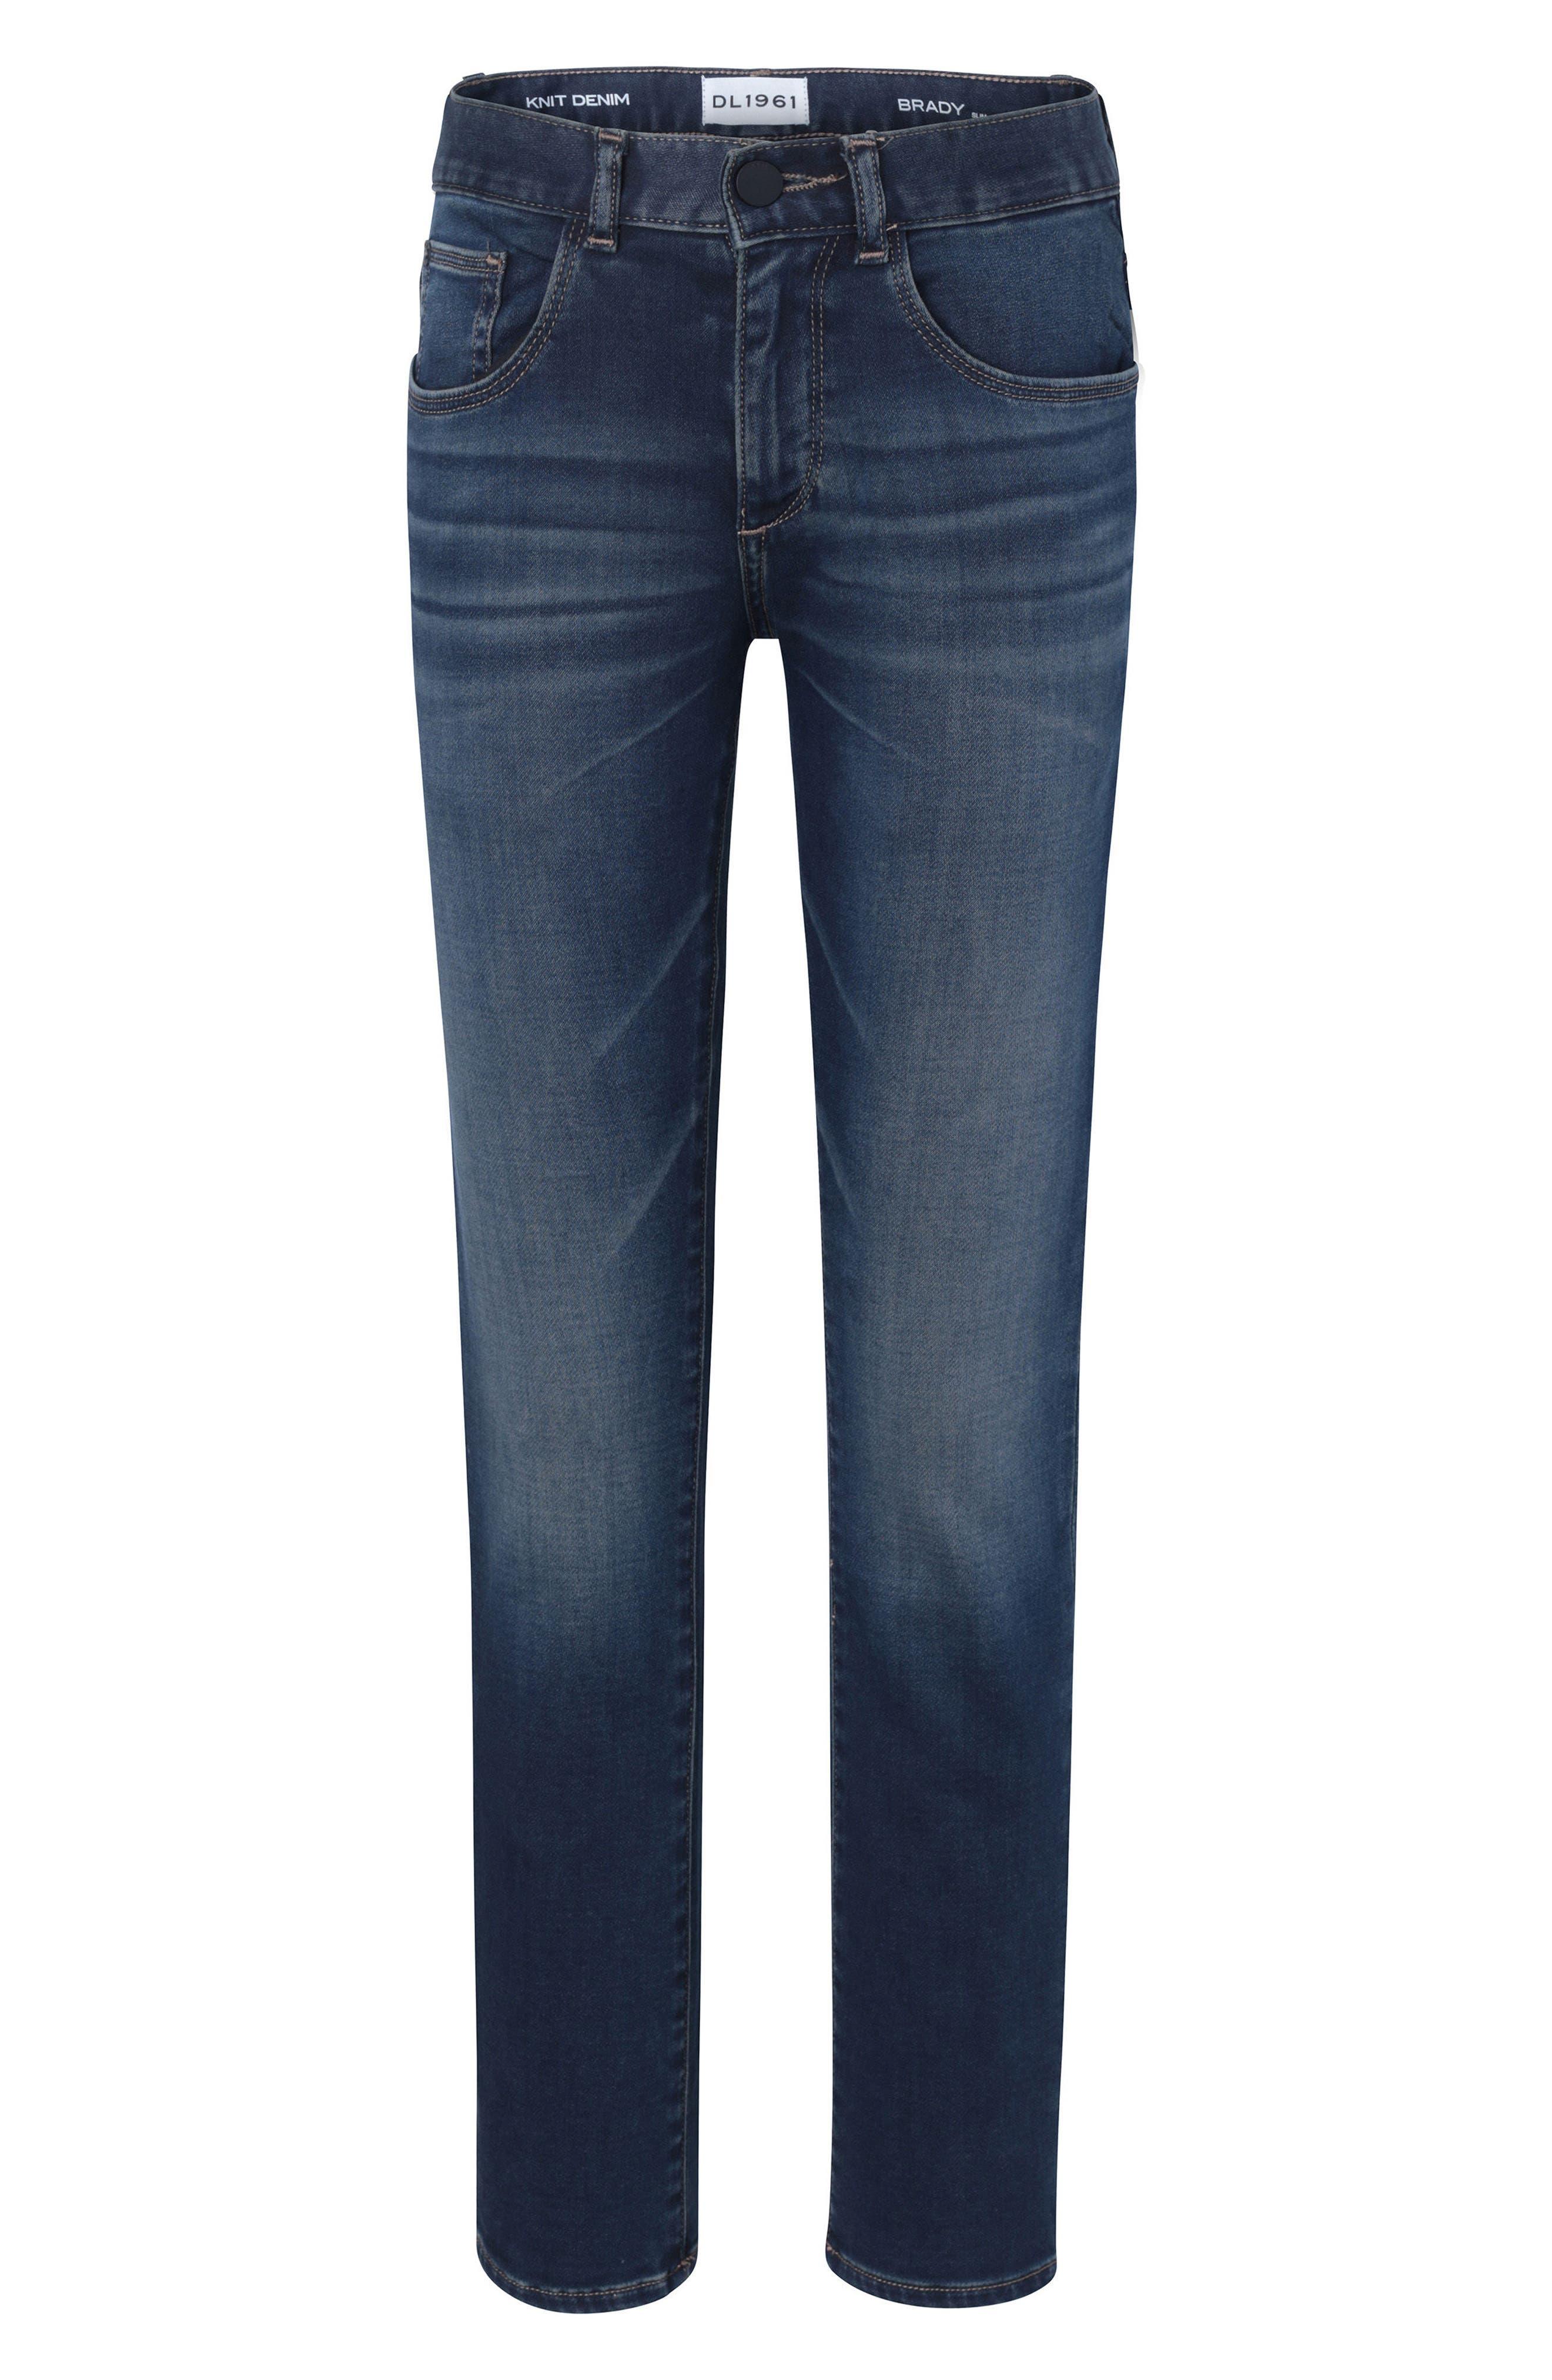 Brady Slim Straight Leg Jeans,                             Main thumbnail 1, color,                             VIBES